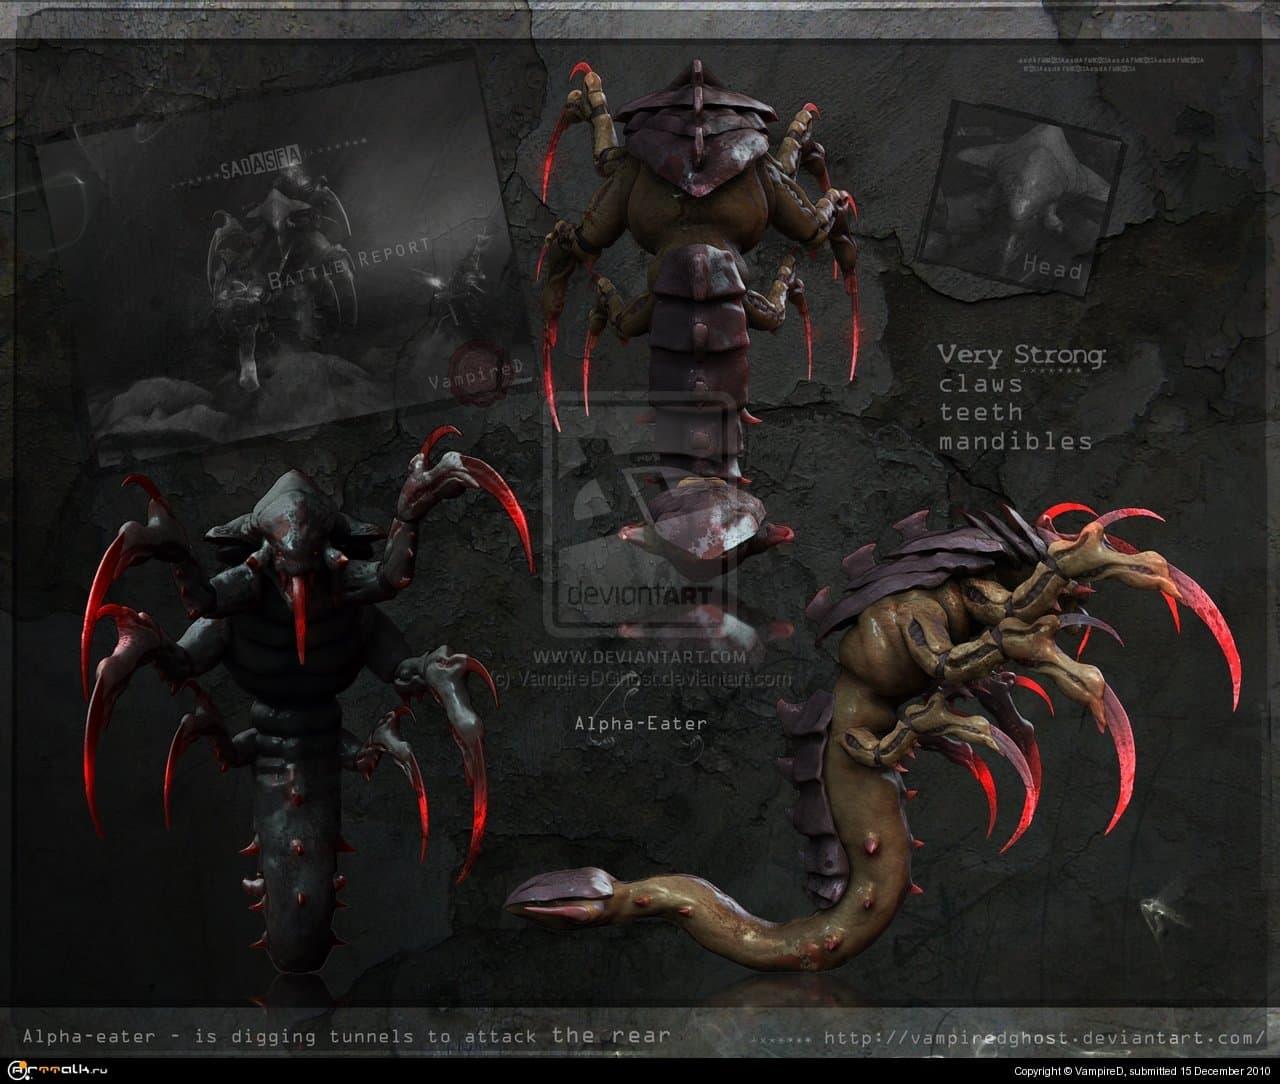 Concept Alpha-eater